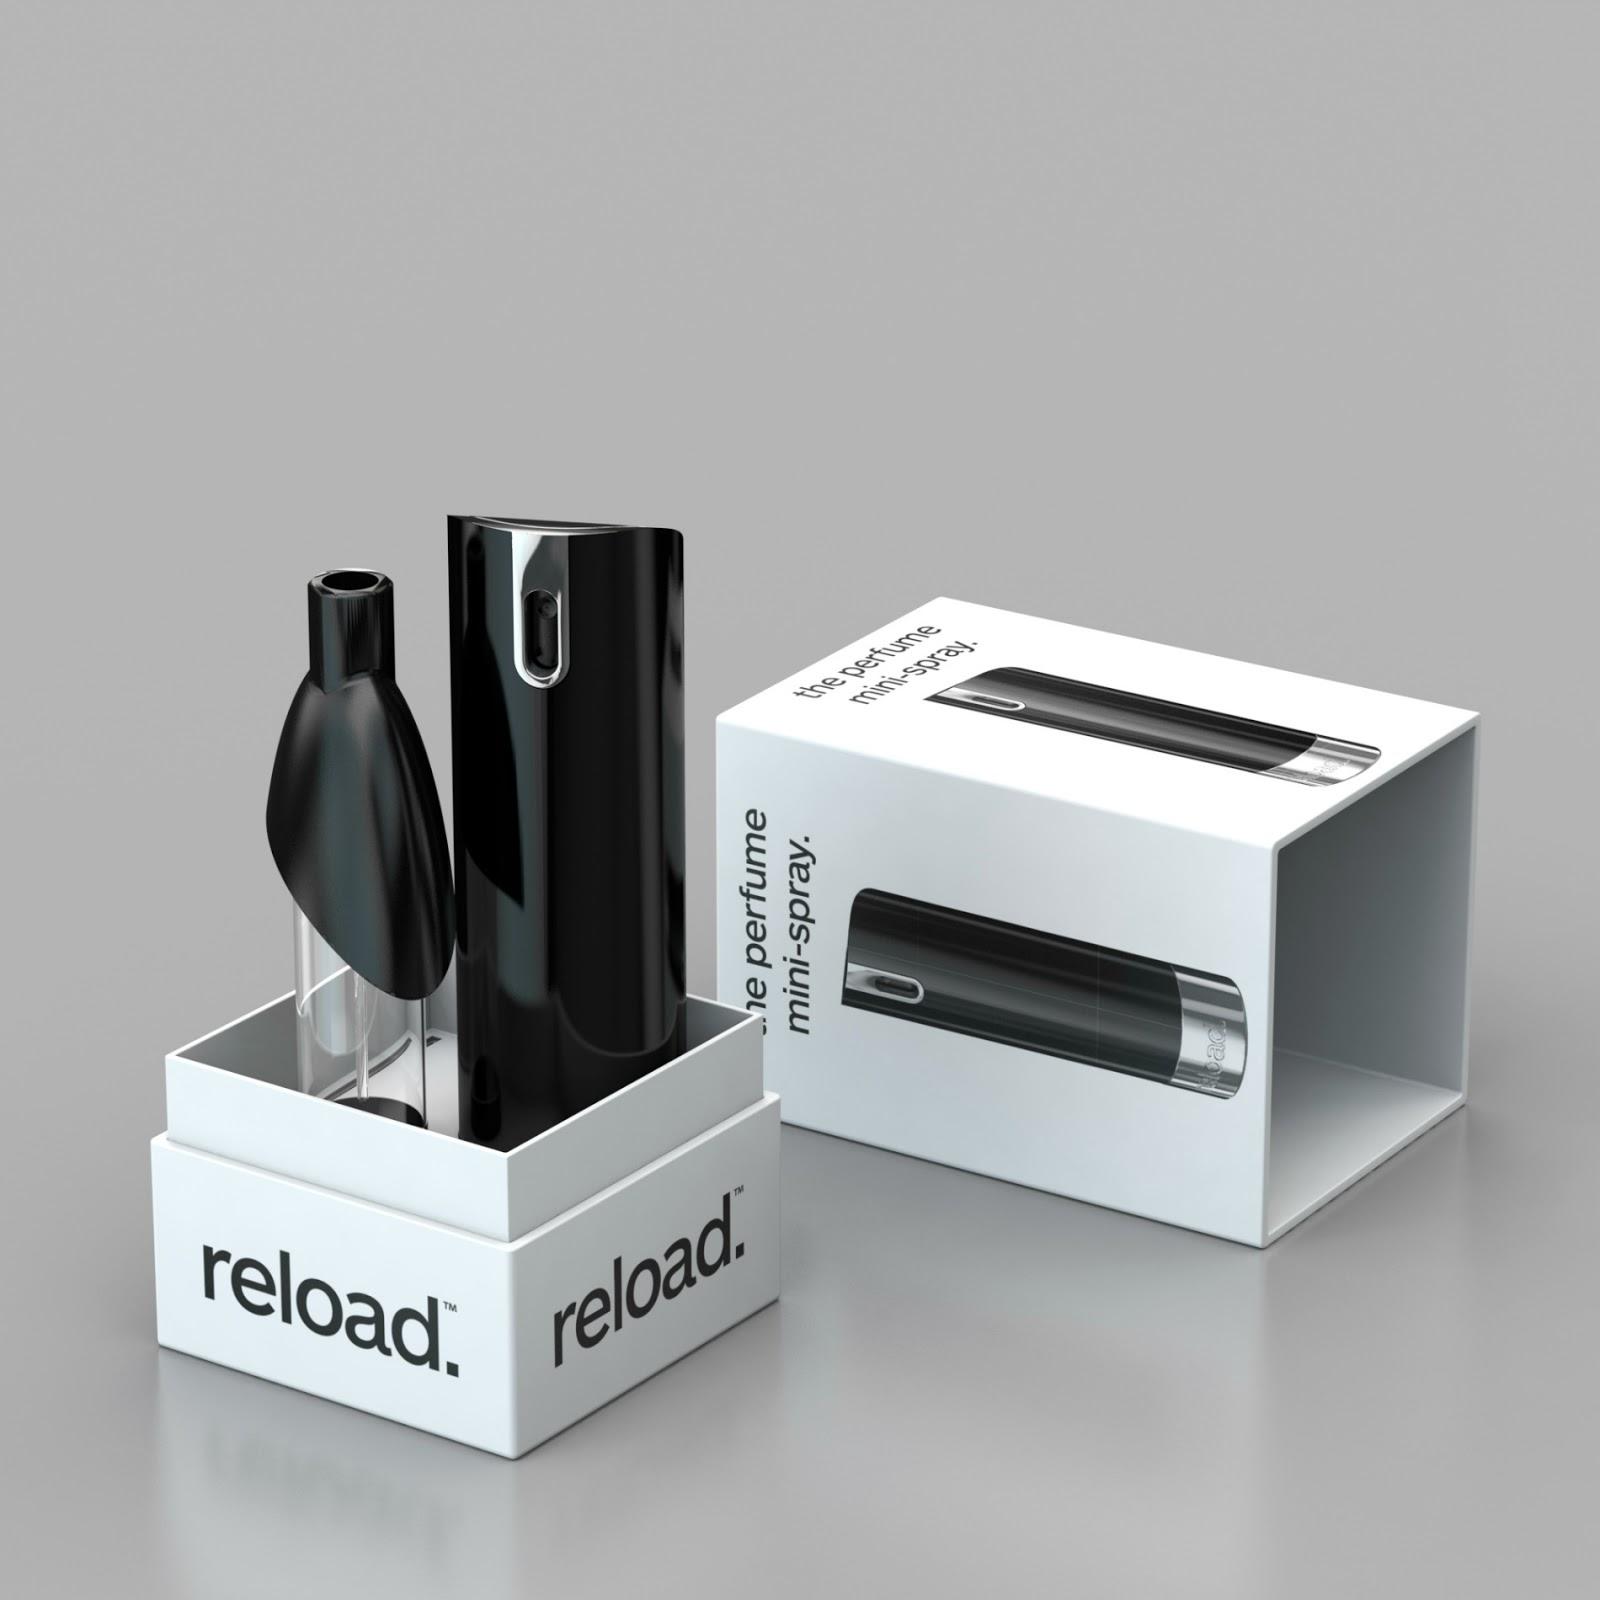 Reload. navulbare minispray